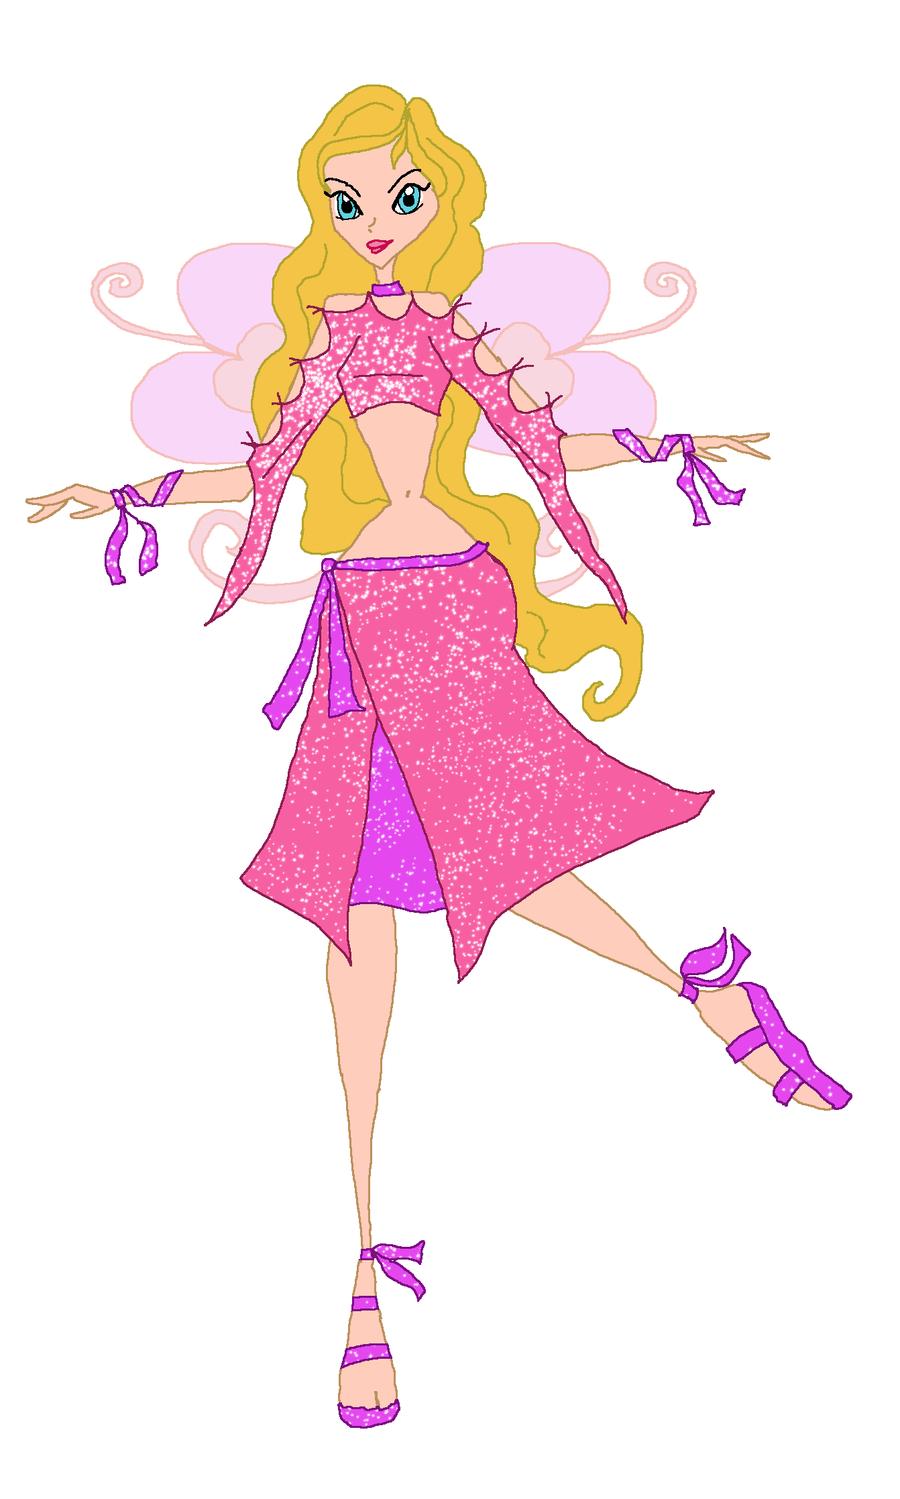 Aphrodite Hermes by PurpleAmharicCoffee on DeviantArt